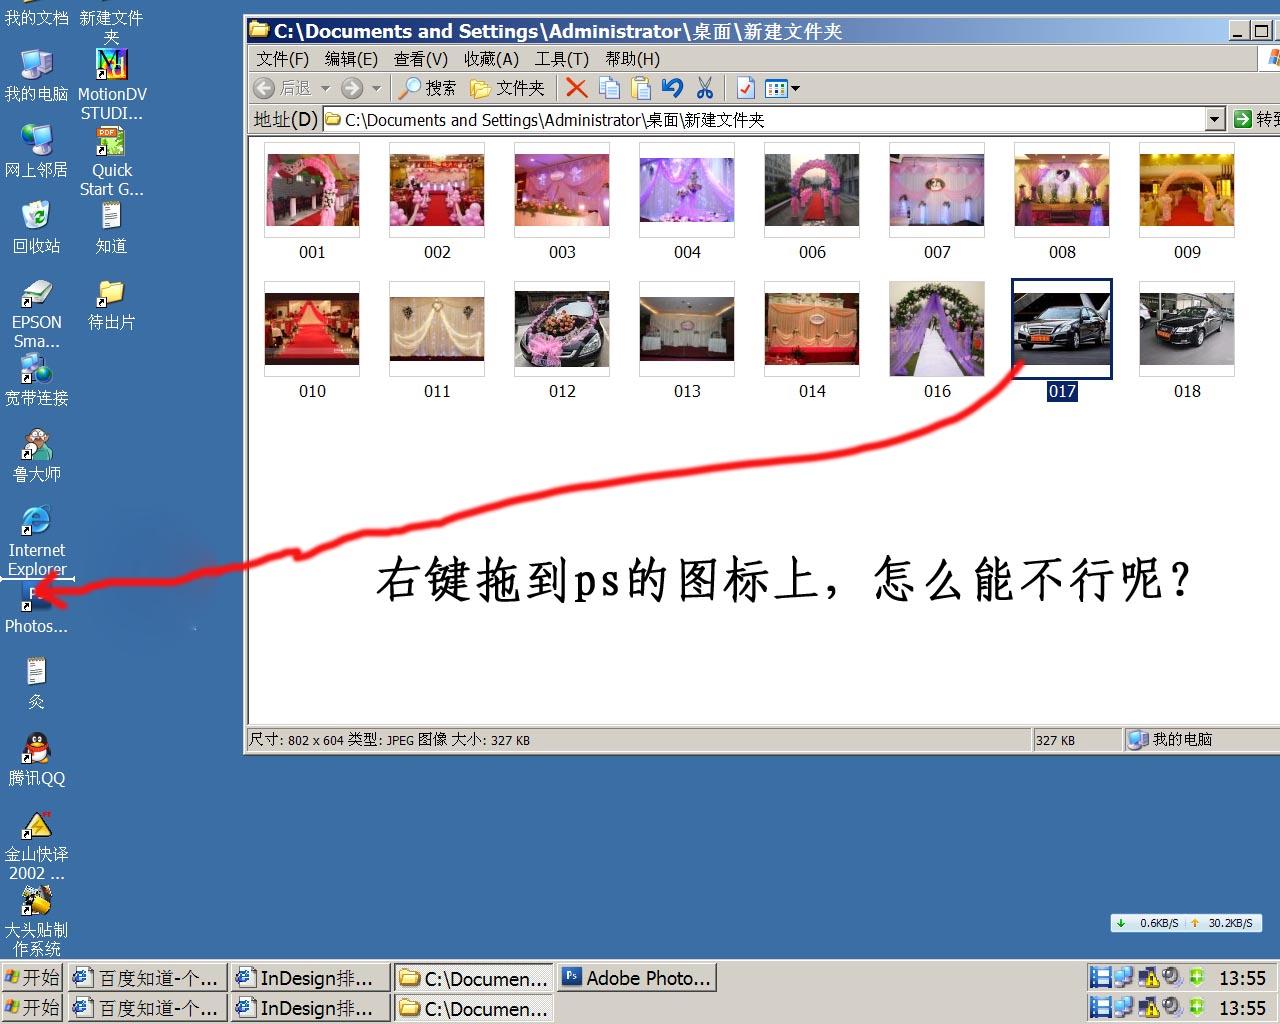 indesign教程 InDesign排版软件应用教程 印刷排版系统图片